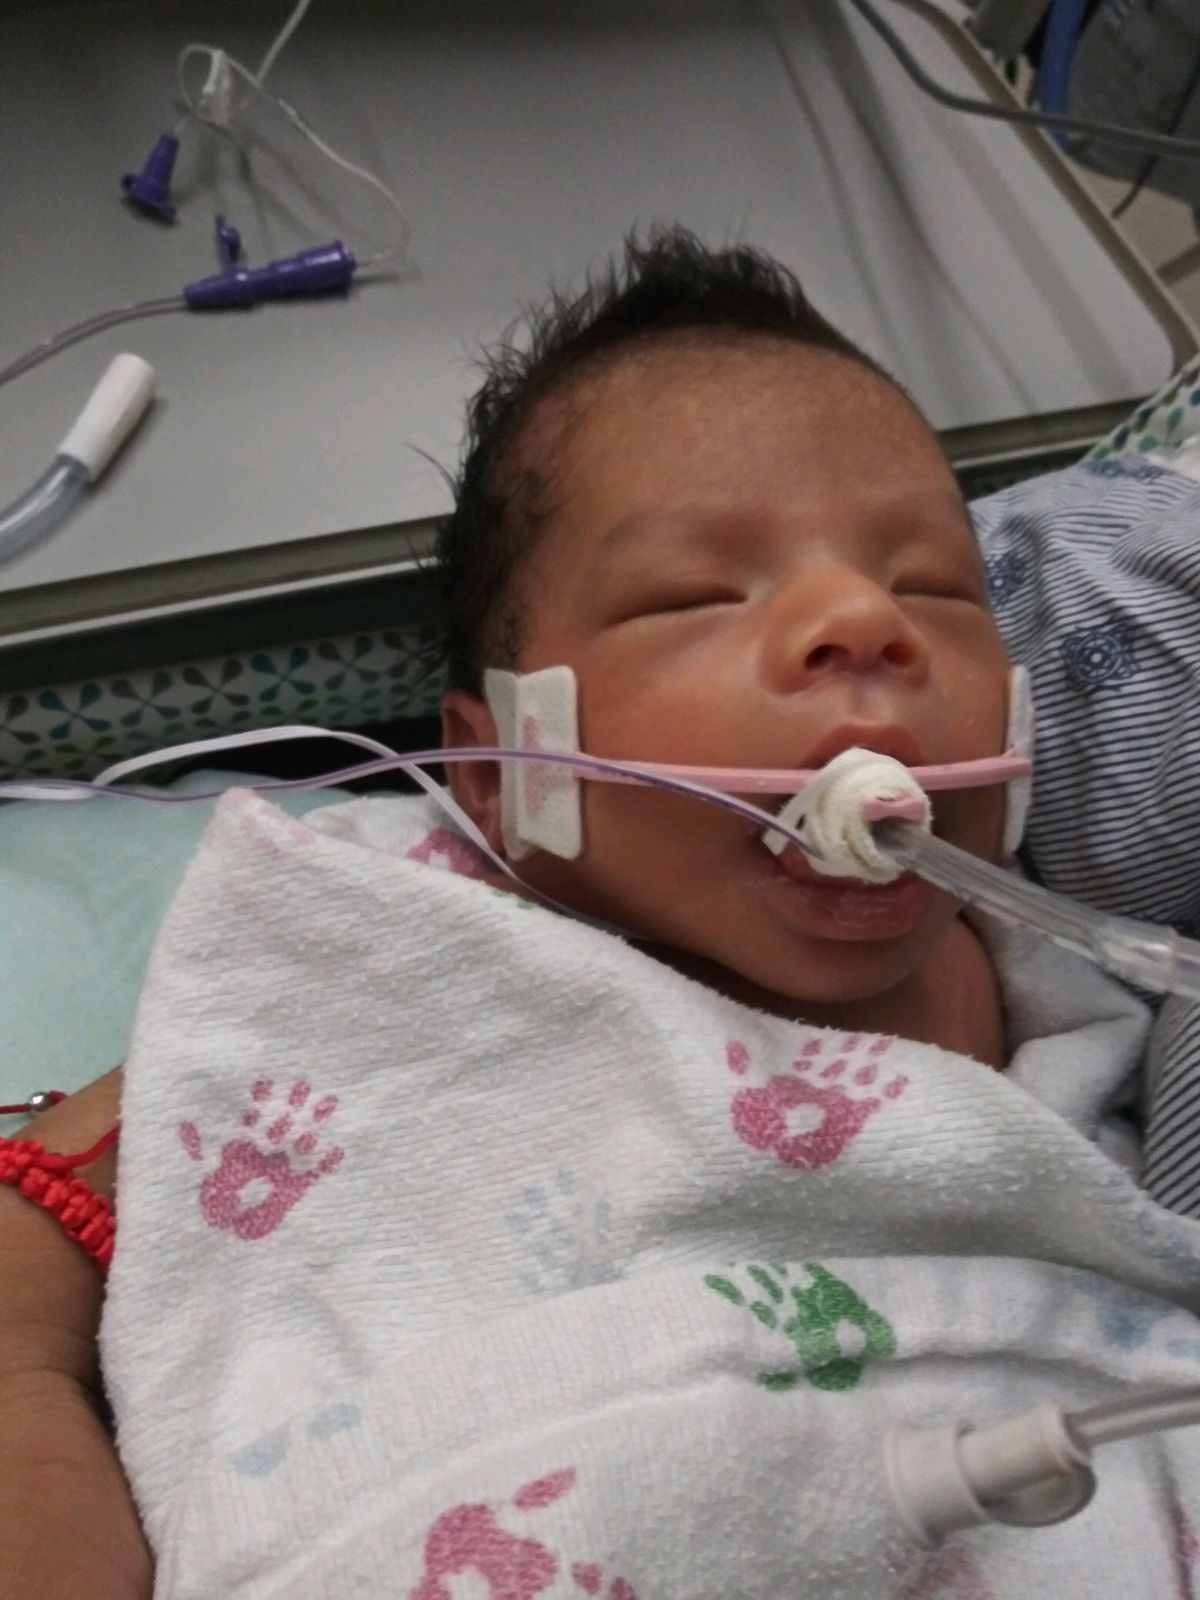 The baby of Yovani Lopez and Marlen Ochoa-Lopez on Sunday at Christ Medical Center.